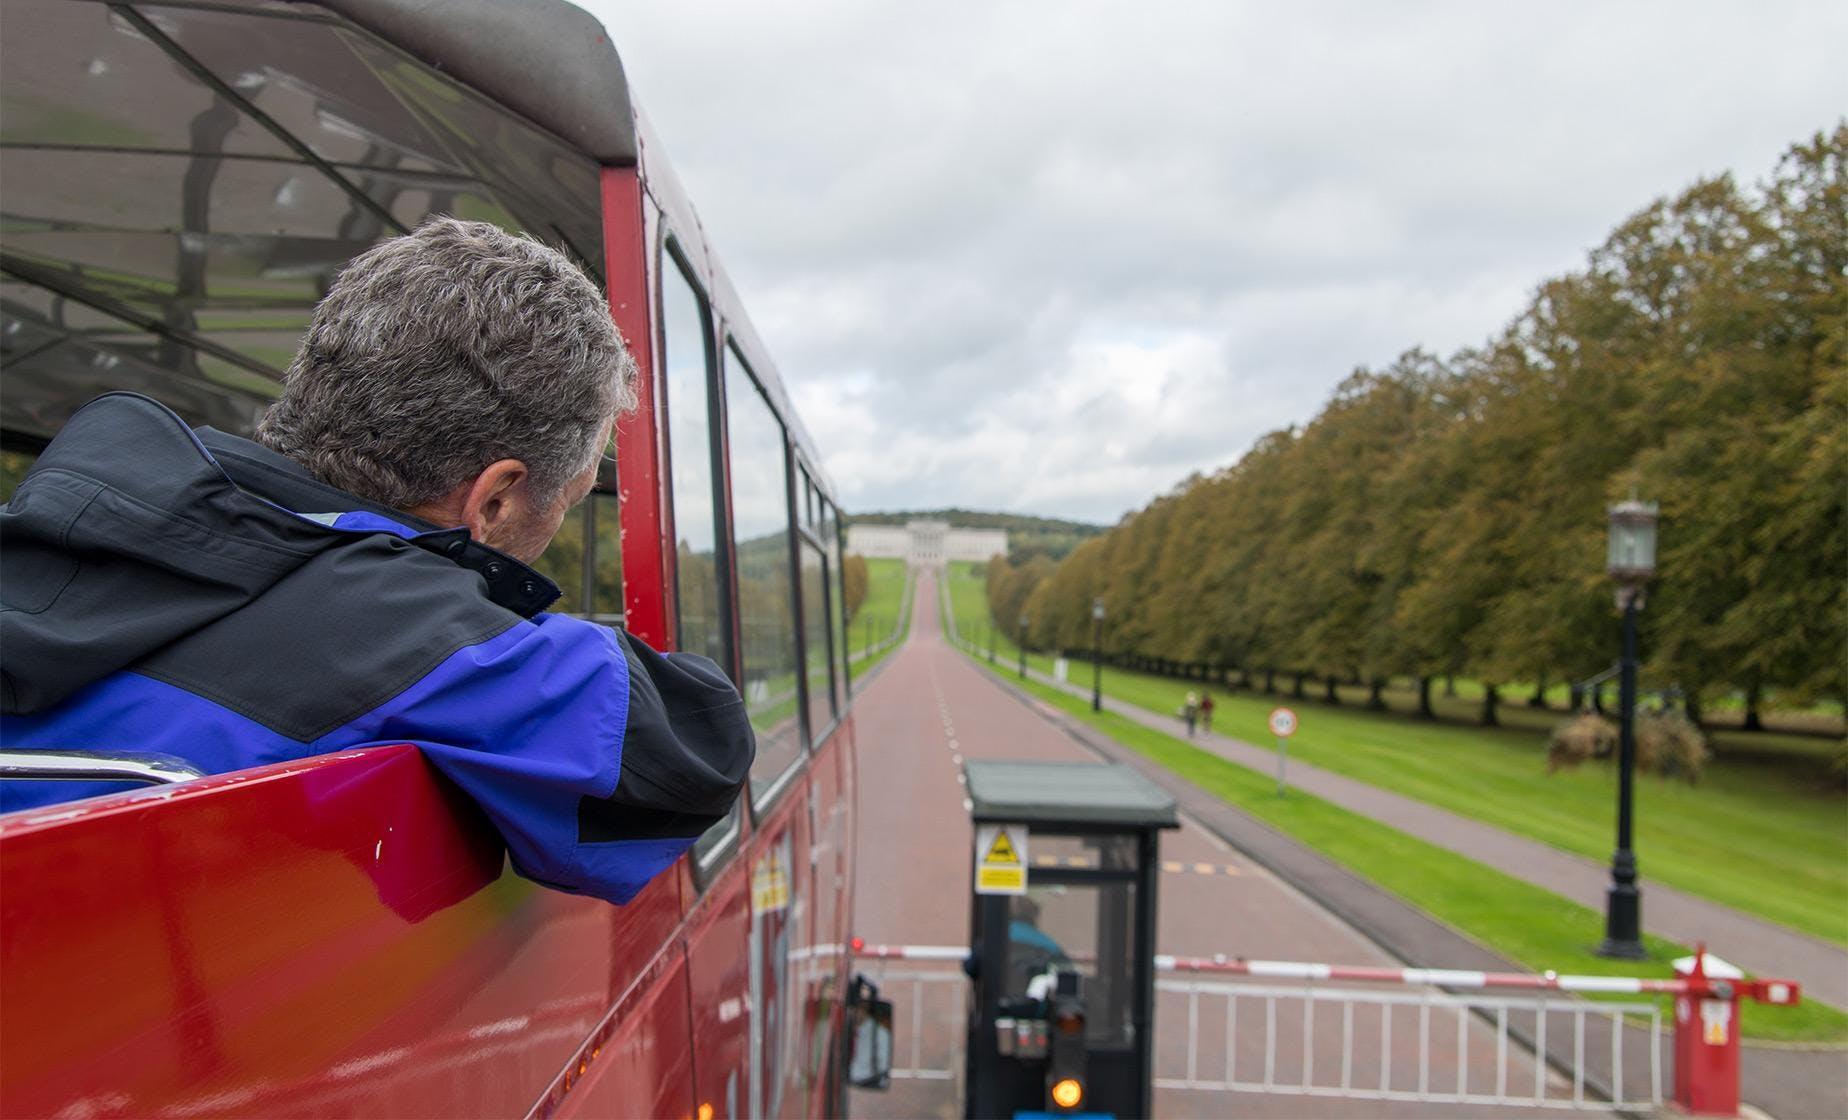 Belfast City Sightseeing Hop On Hop Off Bus